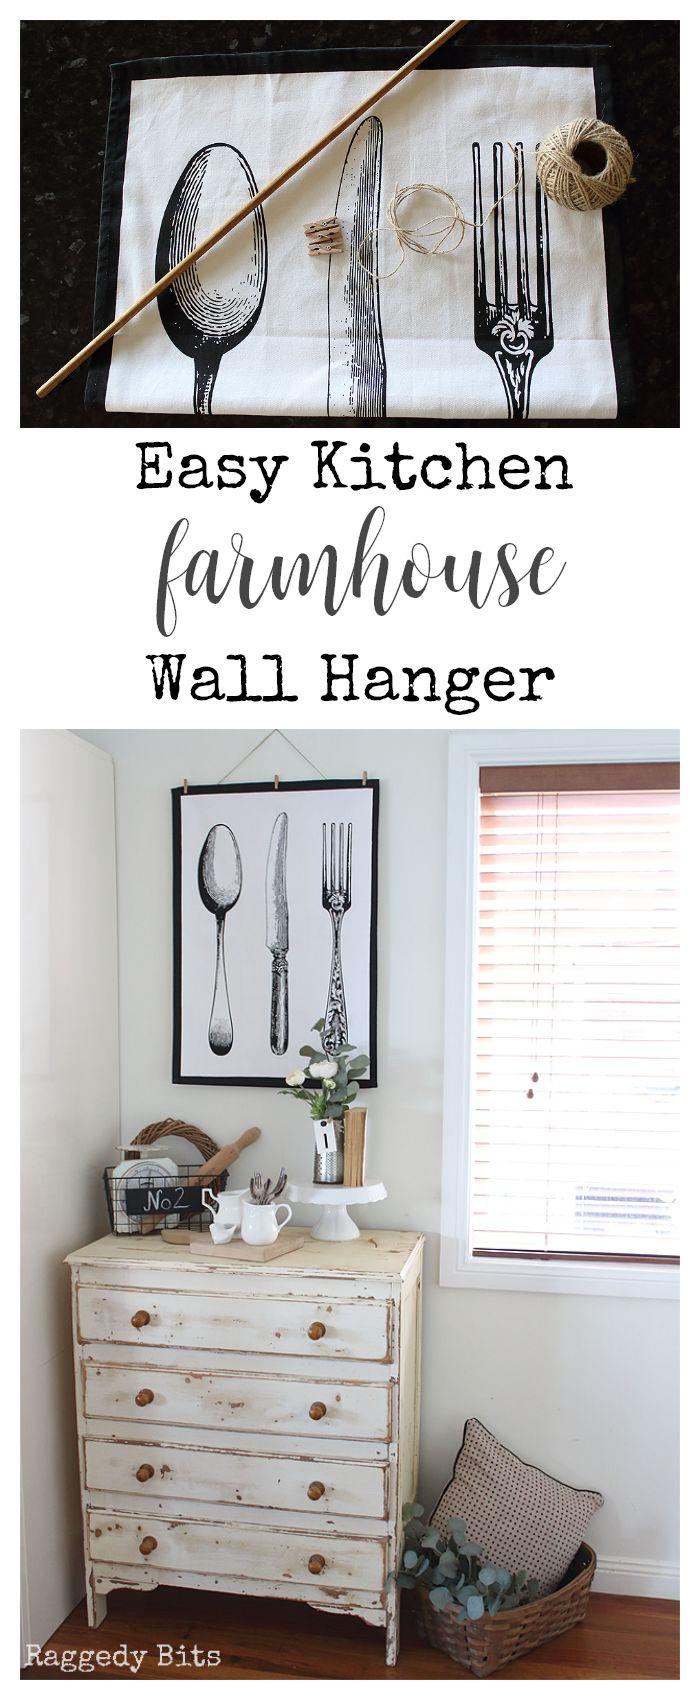 A fun Easy Kitchen Farmhouse Wall Hanger to make to had some farmhouse charm to your kitchen | www.raggedy-bits.com